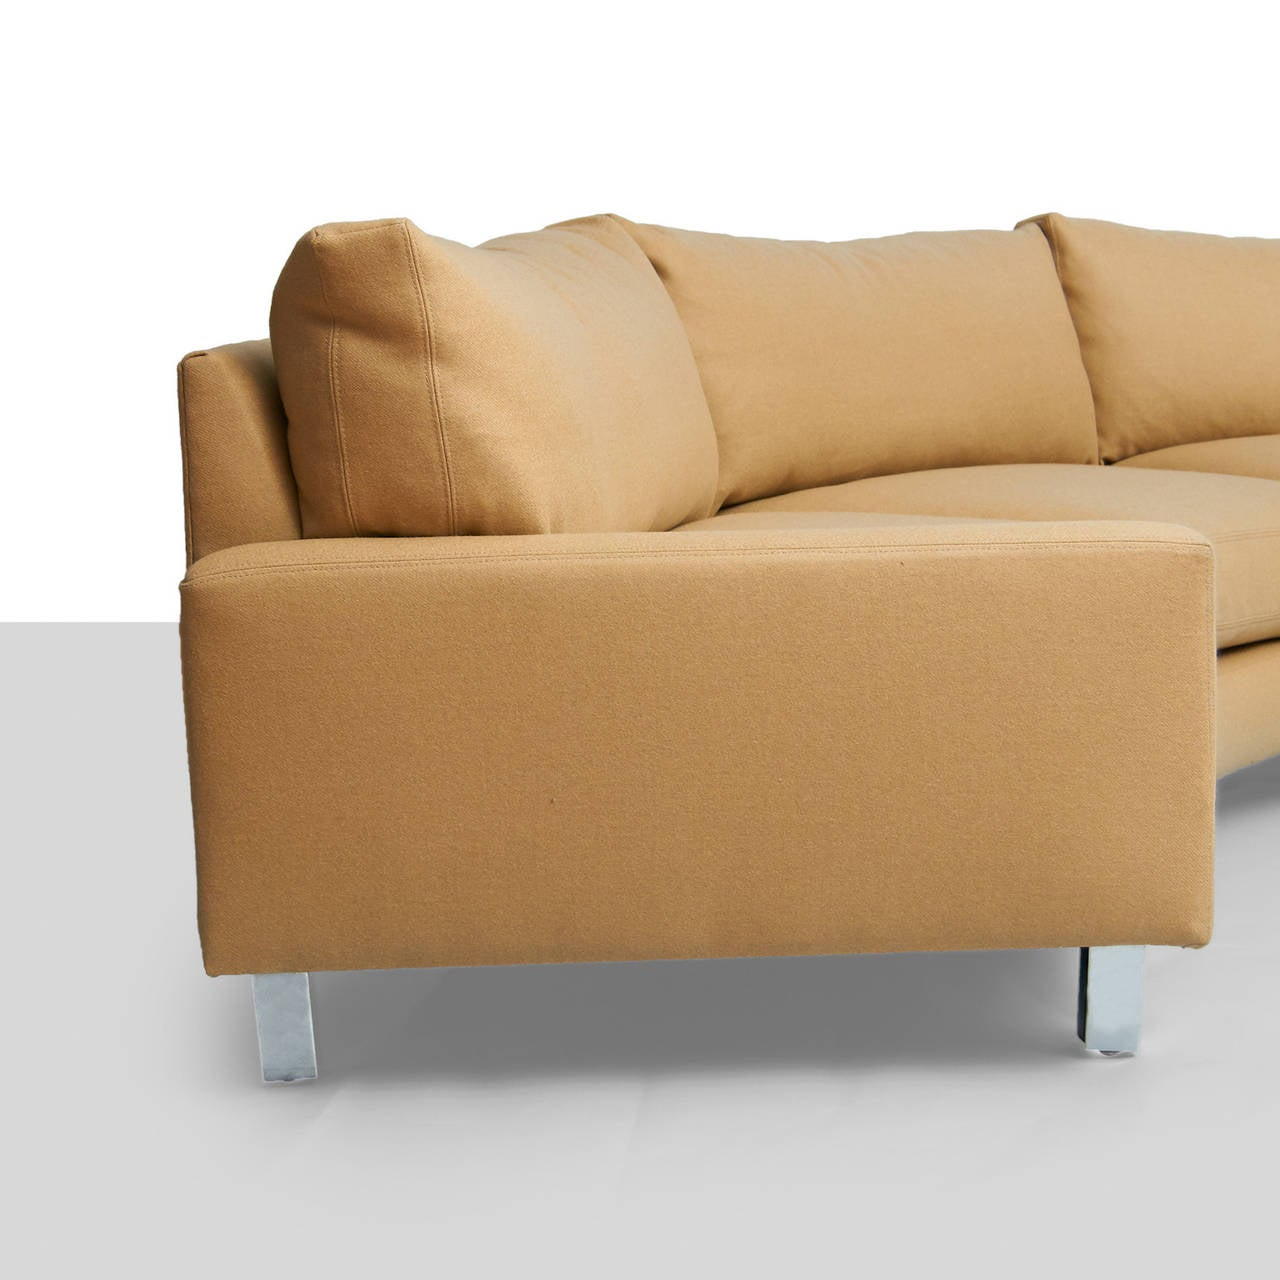 Milo Baughman Sectional Sofa For Sale At 1stdibs